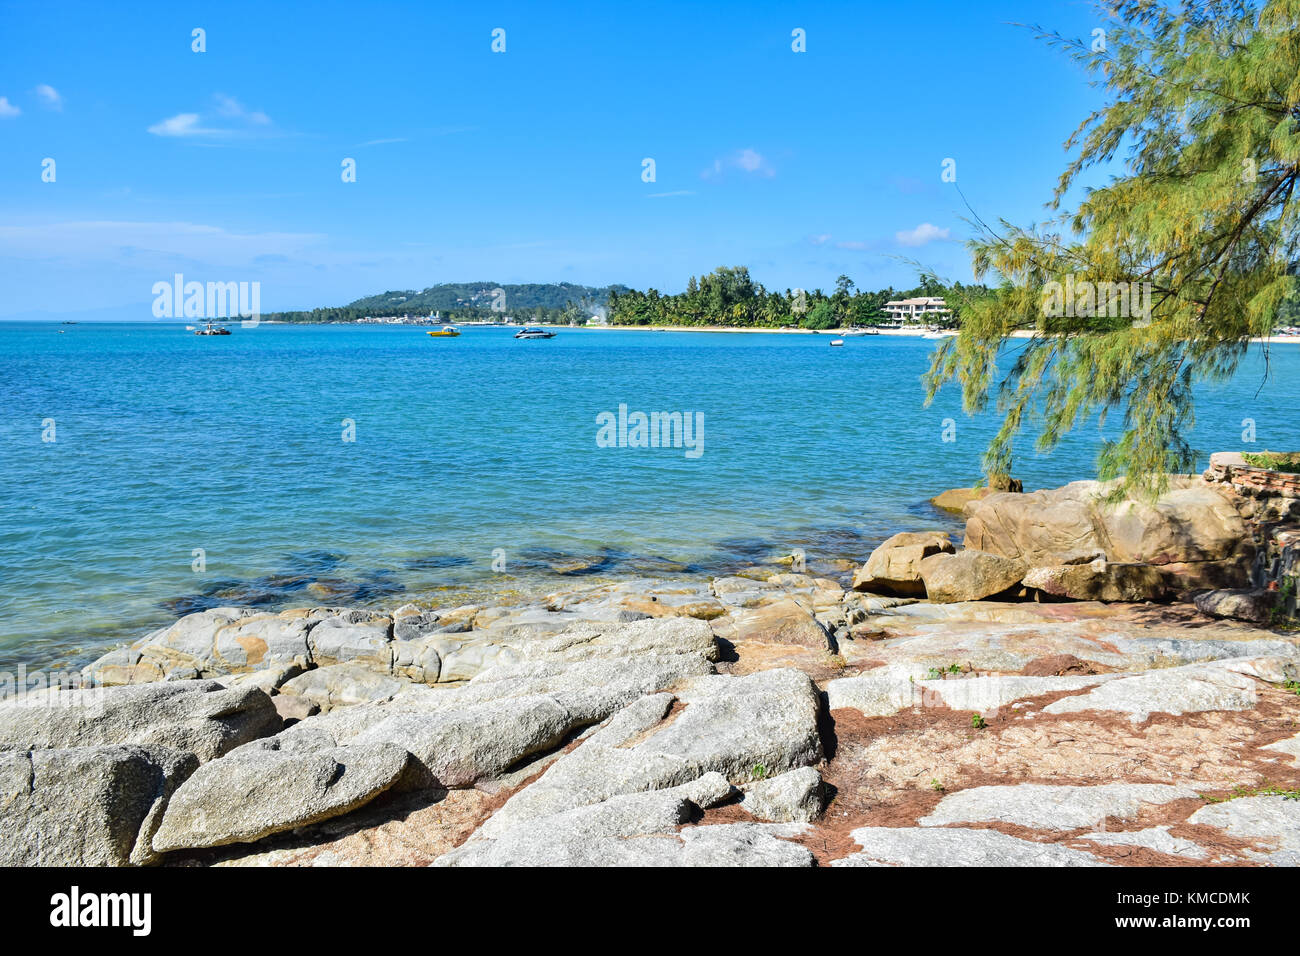 Beautiful seascape of rocky seashore sandy beach in Samui island, Thailand - Stock Image